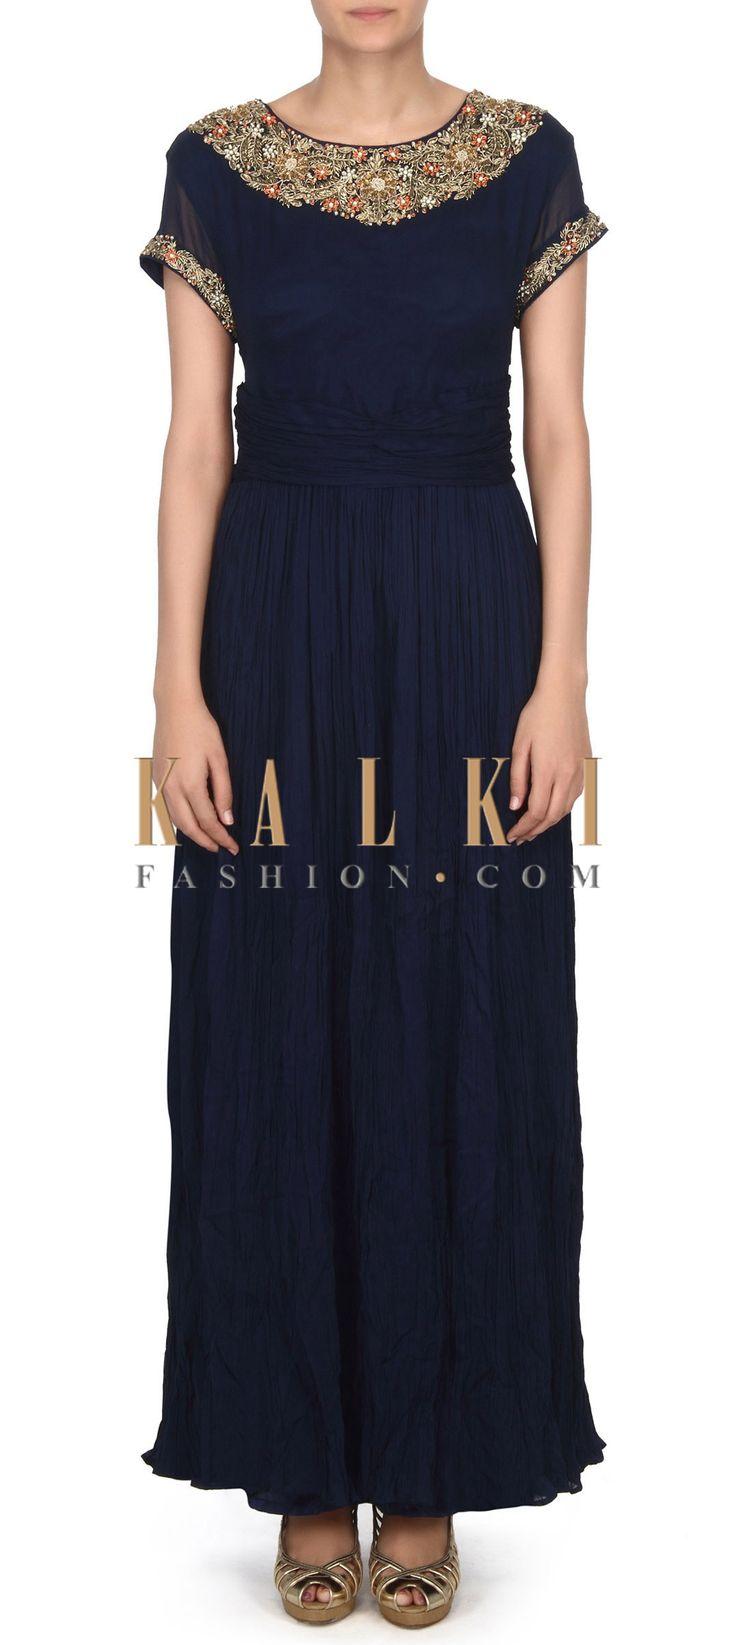 Buy this Navy blue dress with zardosi embroidered neckline only on Kalki